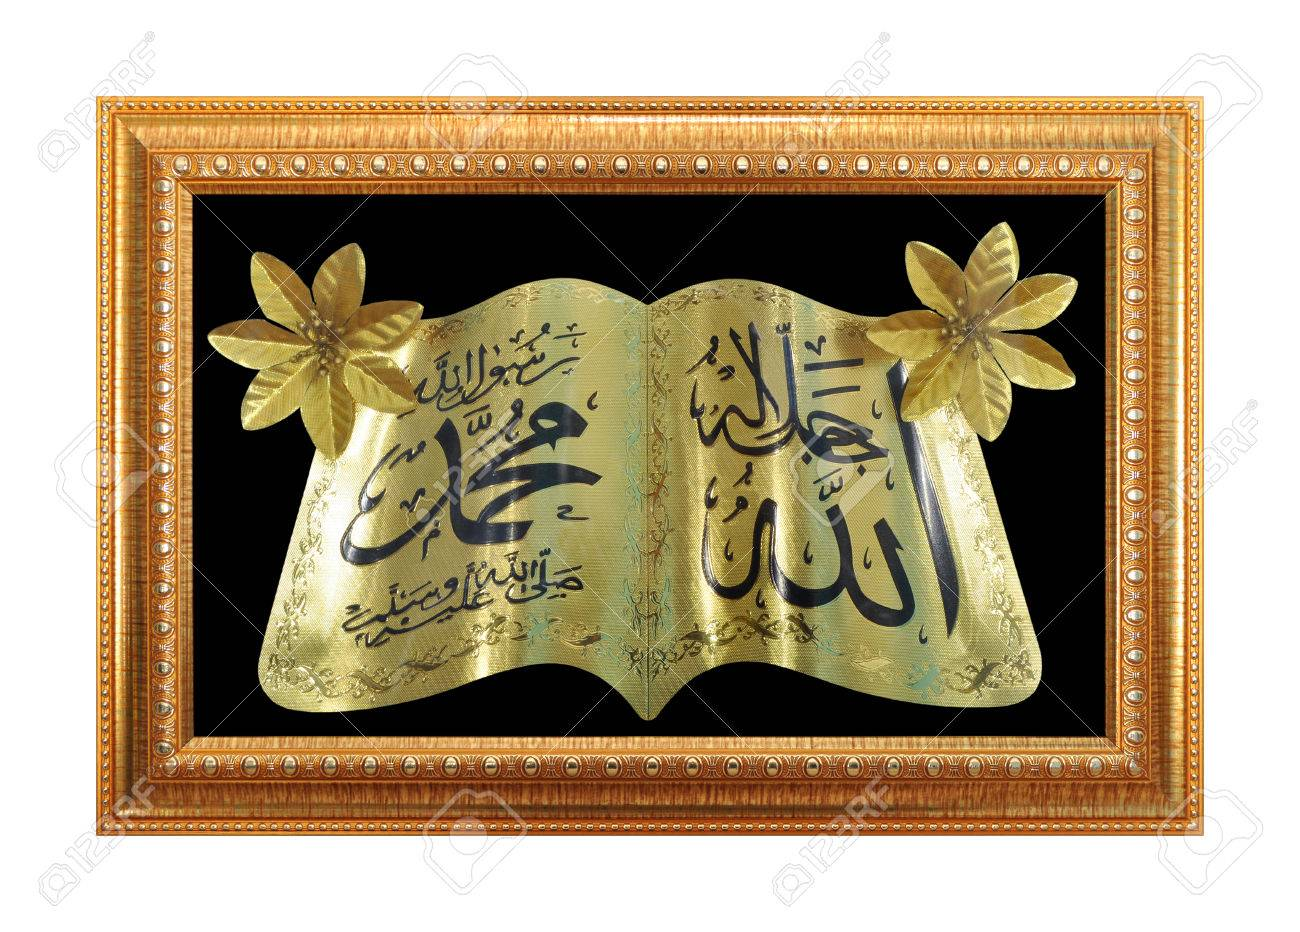 Islamic writing in a beautiful golden frame Stock Photo - 25835697